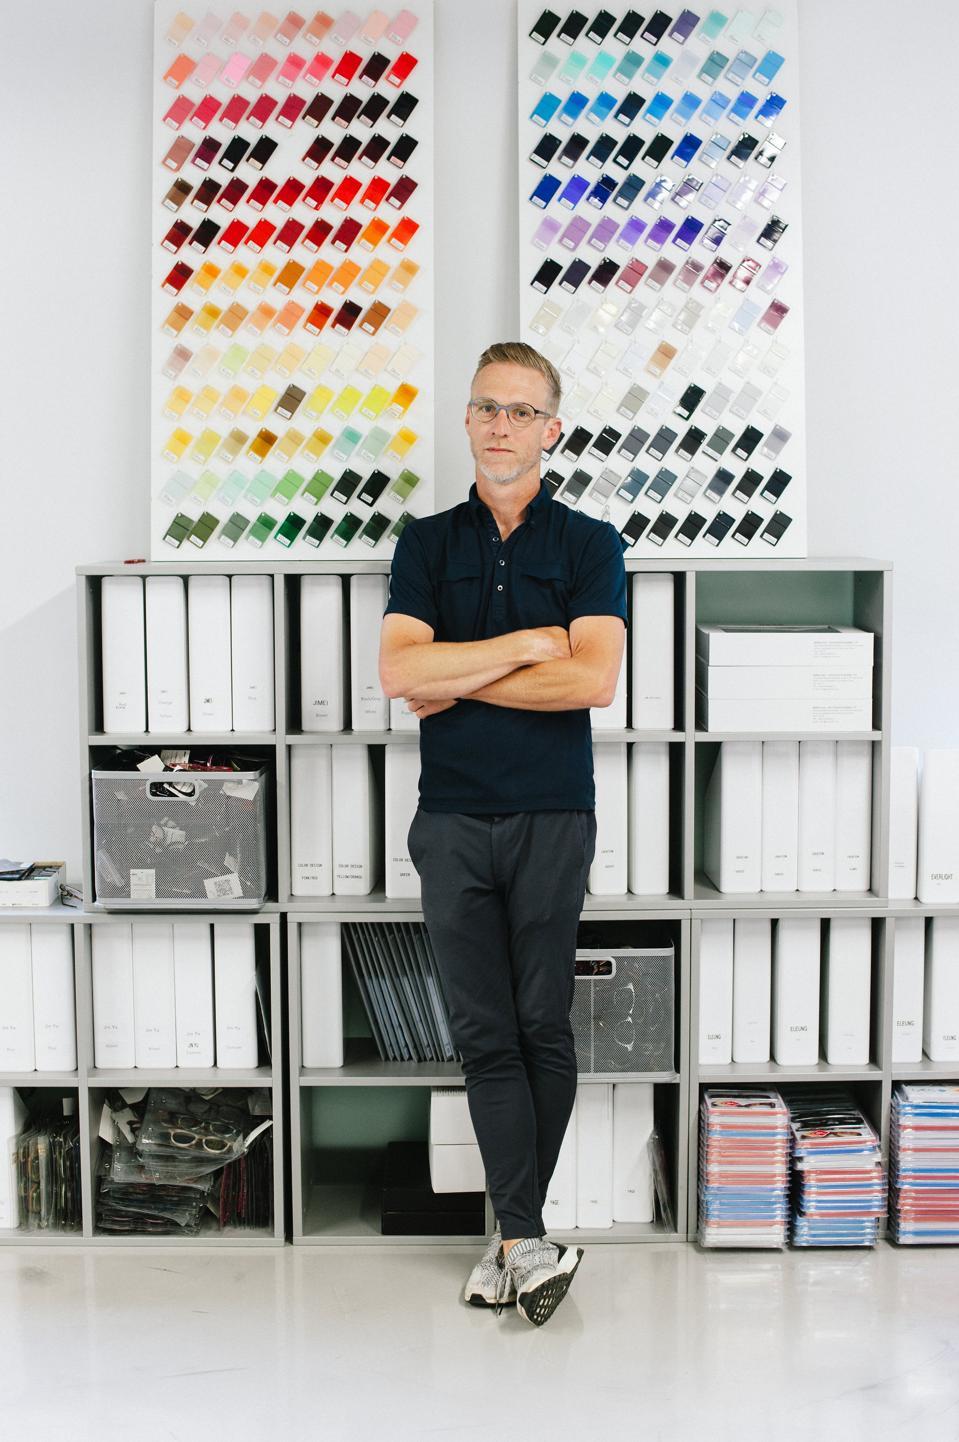 Jason Wehlage Director of Product and Design, Kenmark Eyewear -Penguin Sunglasses